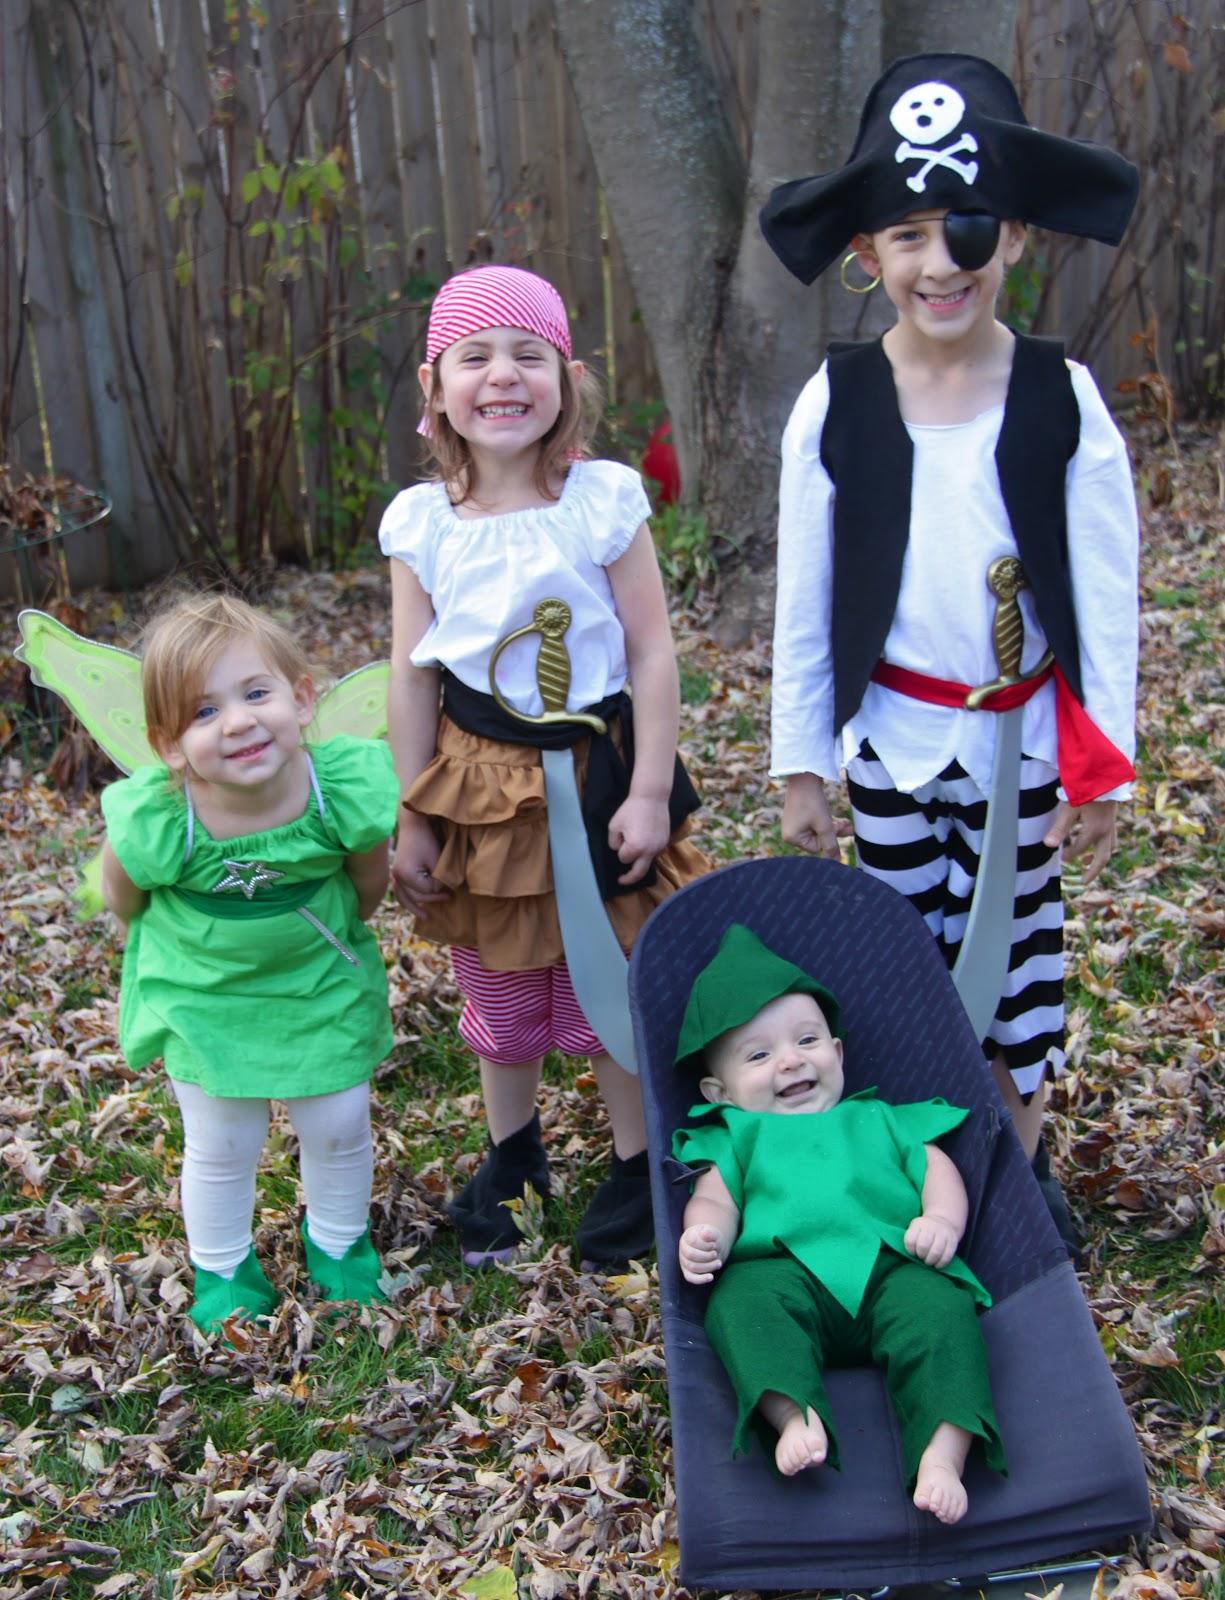 Peter Pan Halloween Costumes  sc 1 st  Smashed Peas u0026 Carrots & Peter Pan Halloween Costumes - Smashed Peas u0026 Carrots